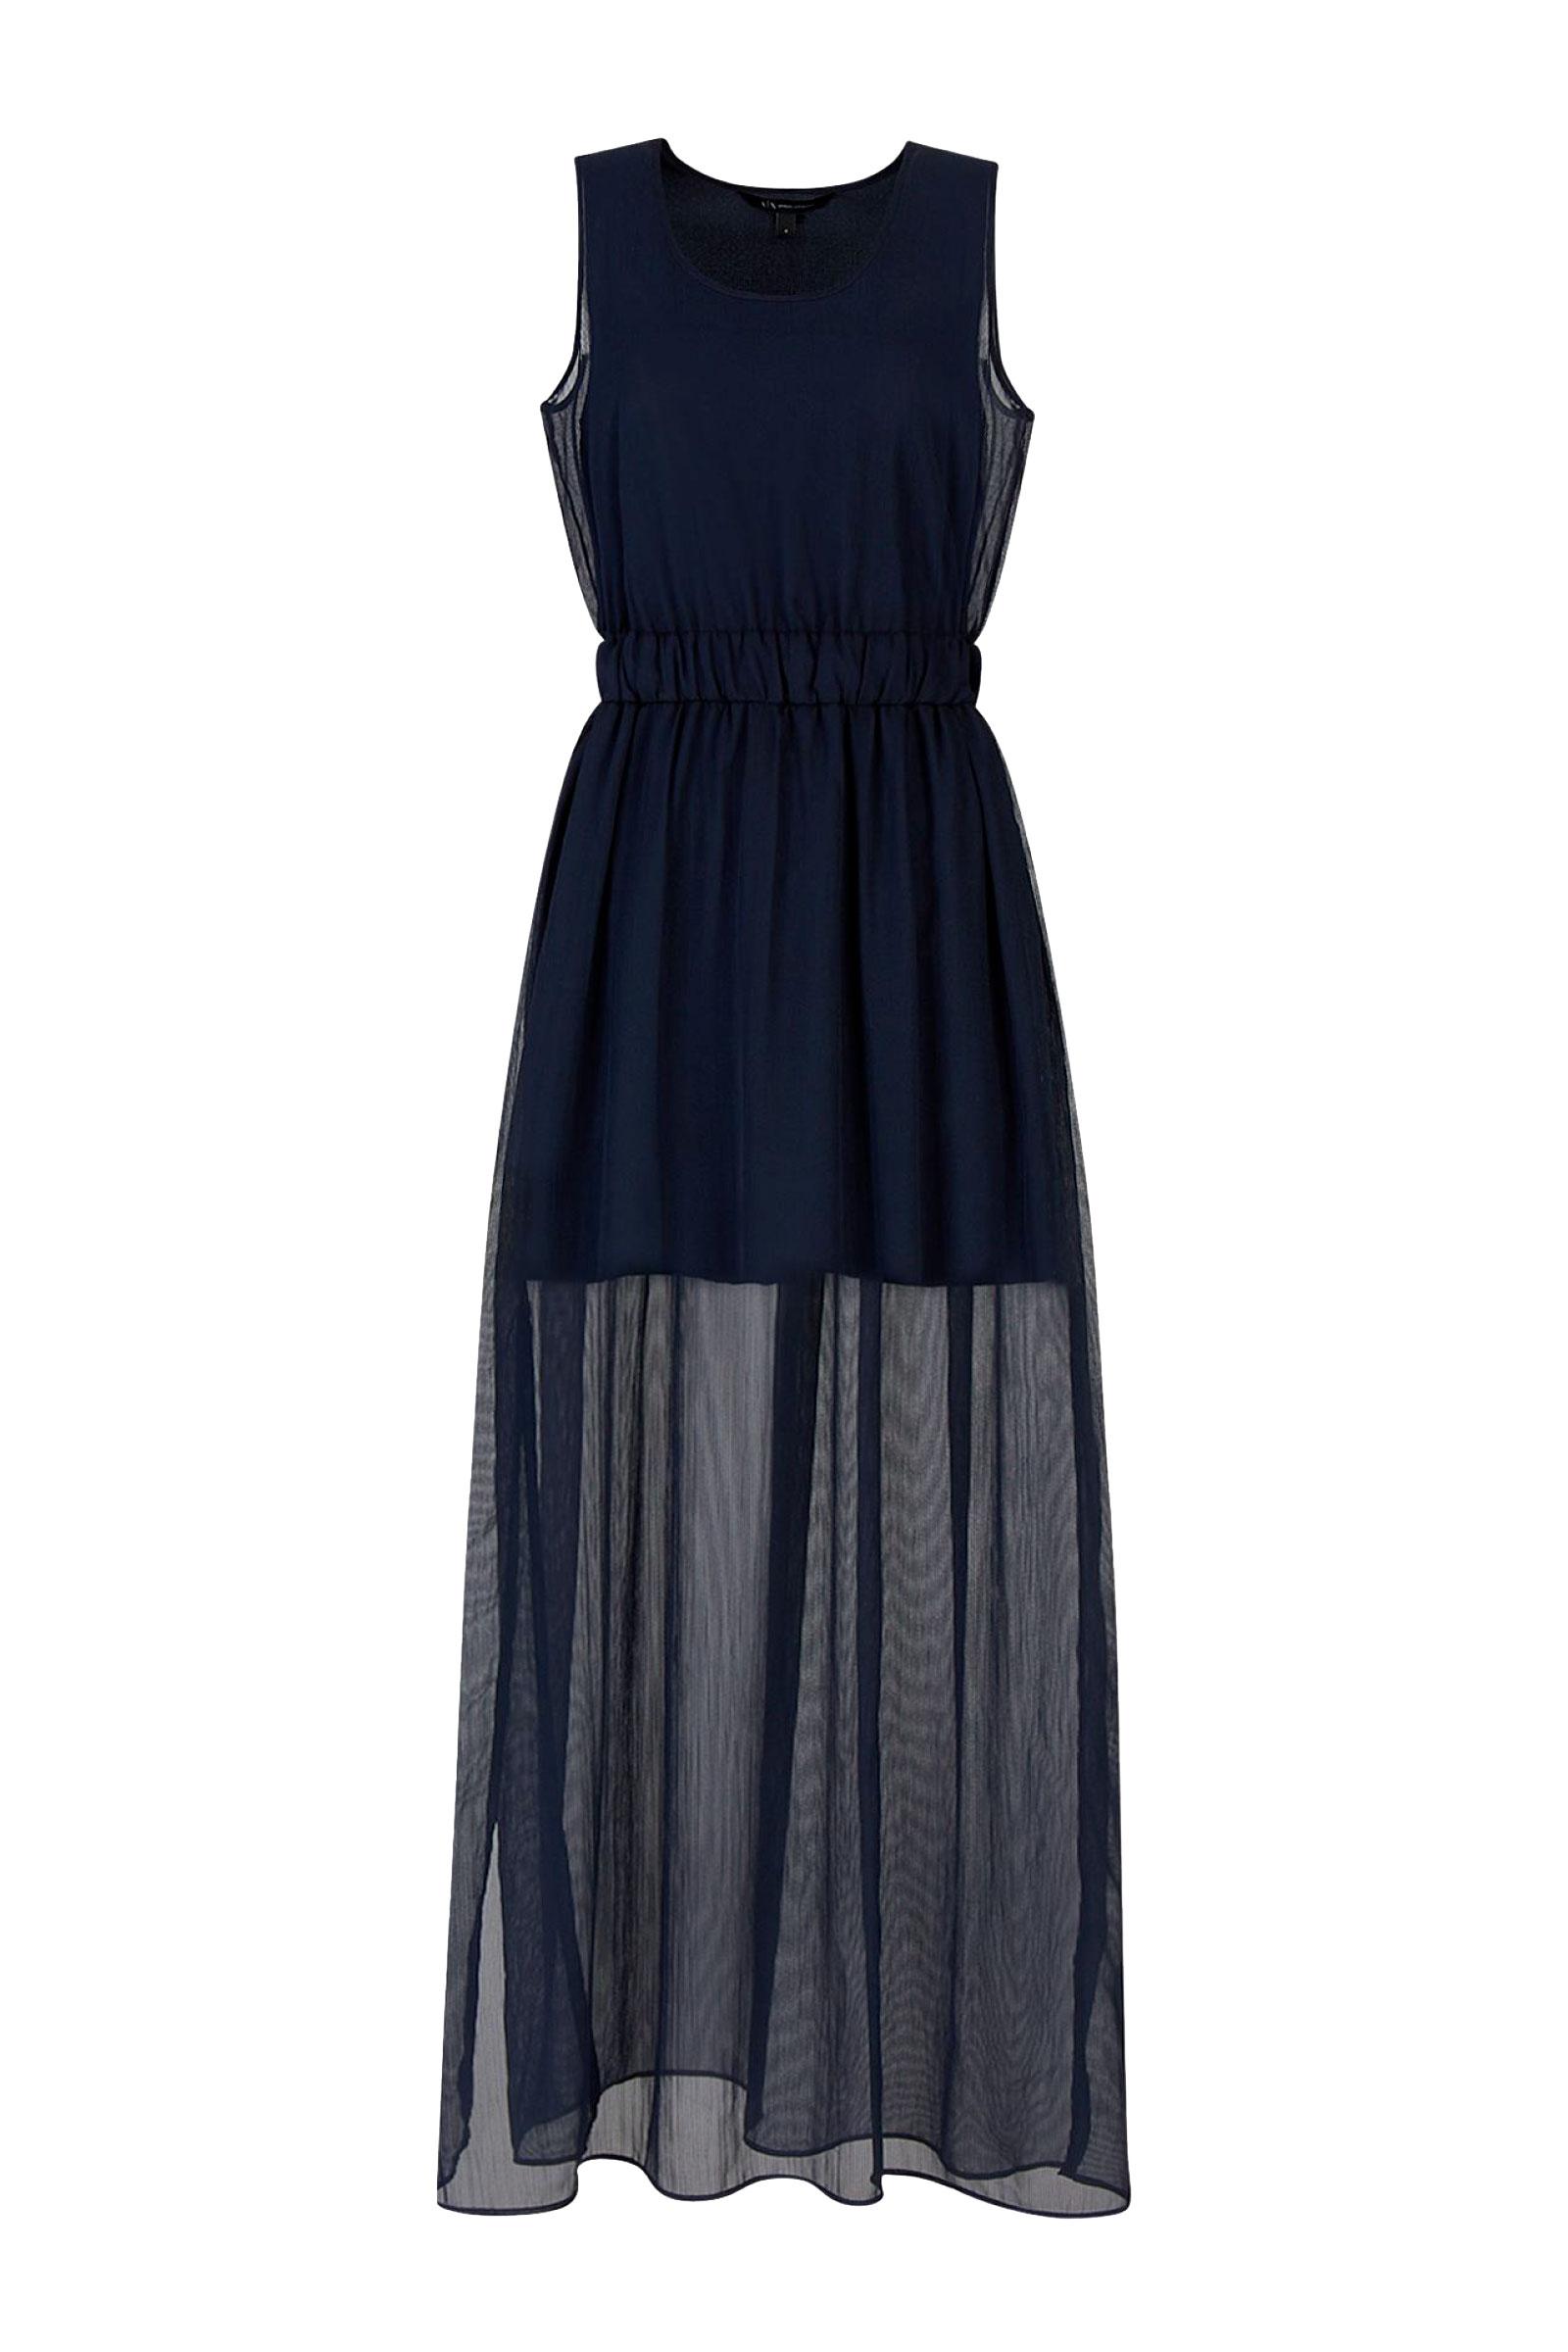 ARMANI EXCHANGE | Dress | 3KYA40 YNSLZ1593